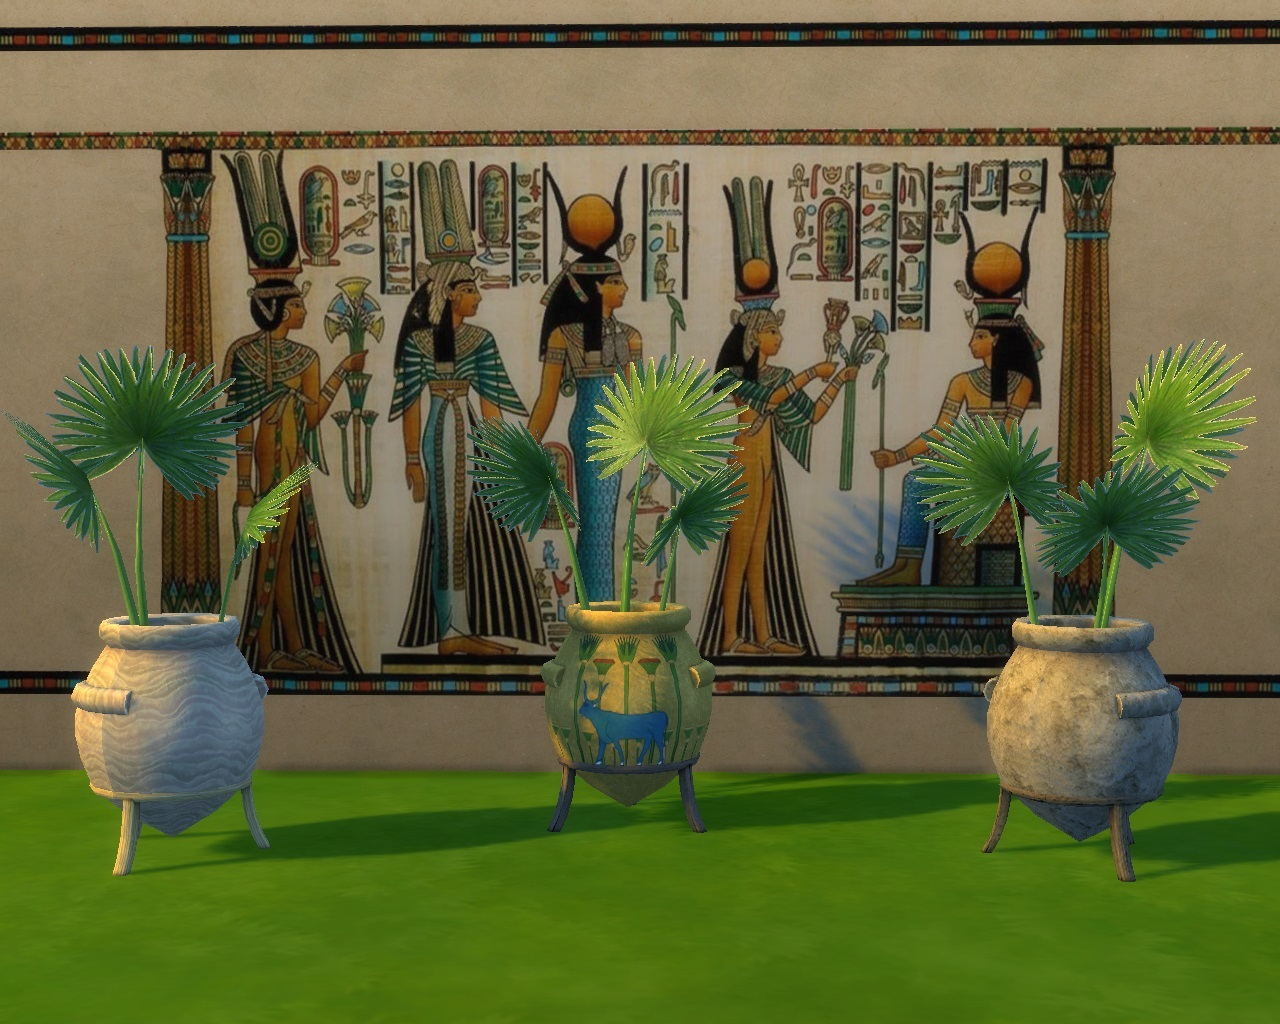 My Sims 4 Blog TS3 Ancient Egypt Conversions By Mara45123